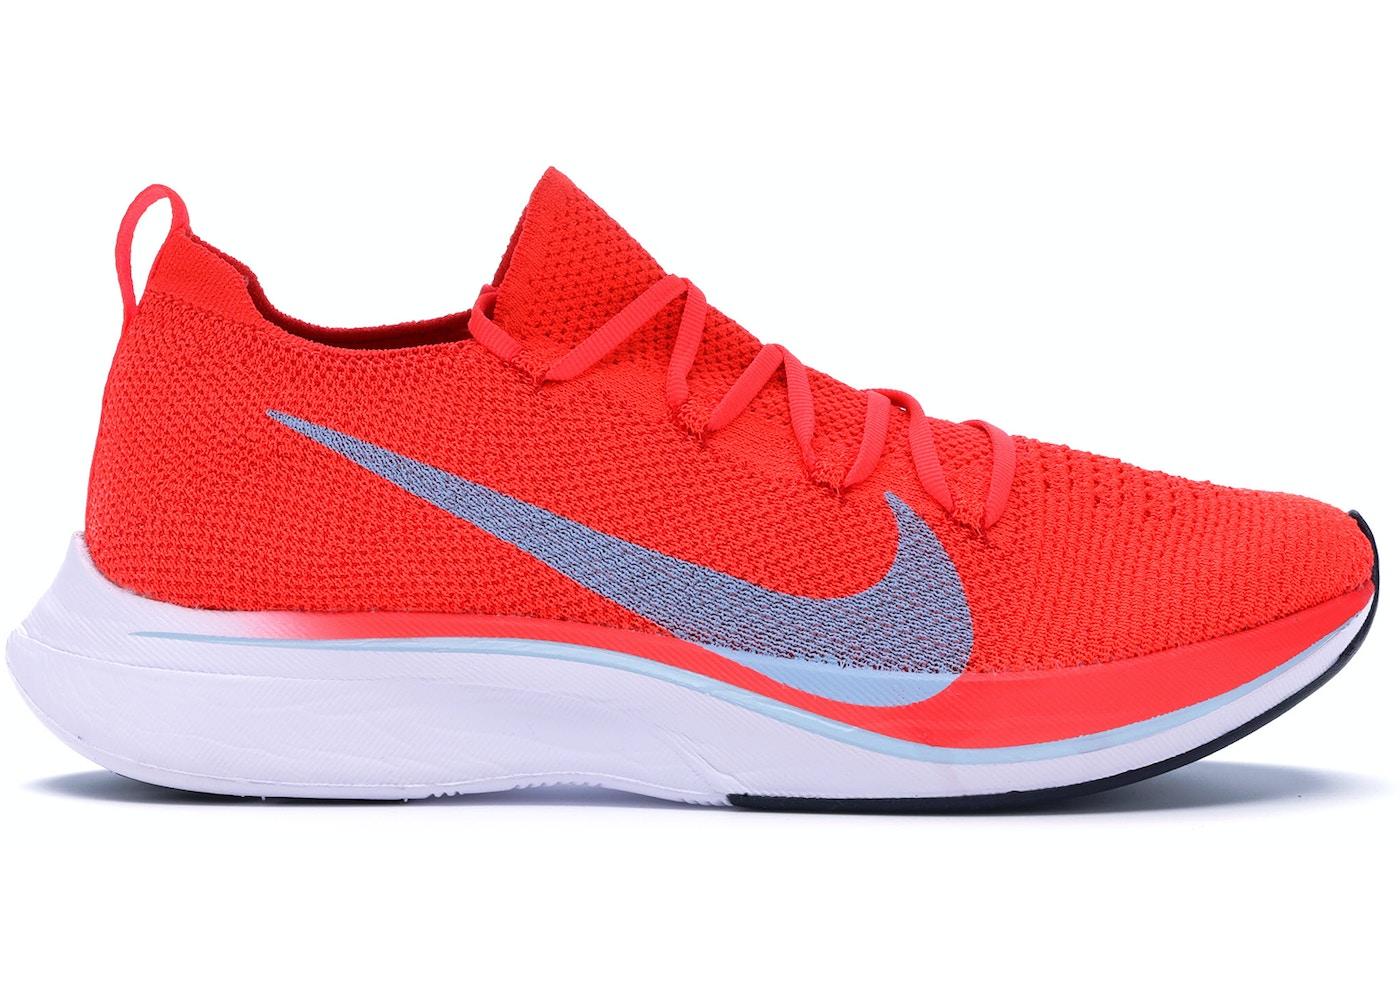 b01b67627c1b Nike Zoom VaporFly 4% Flyknit Bright Crimson - AJ3857-600